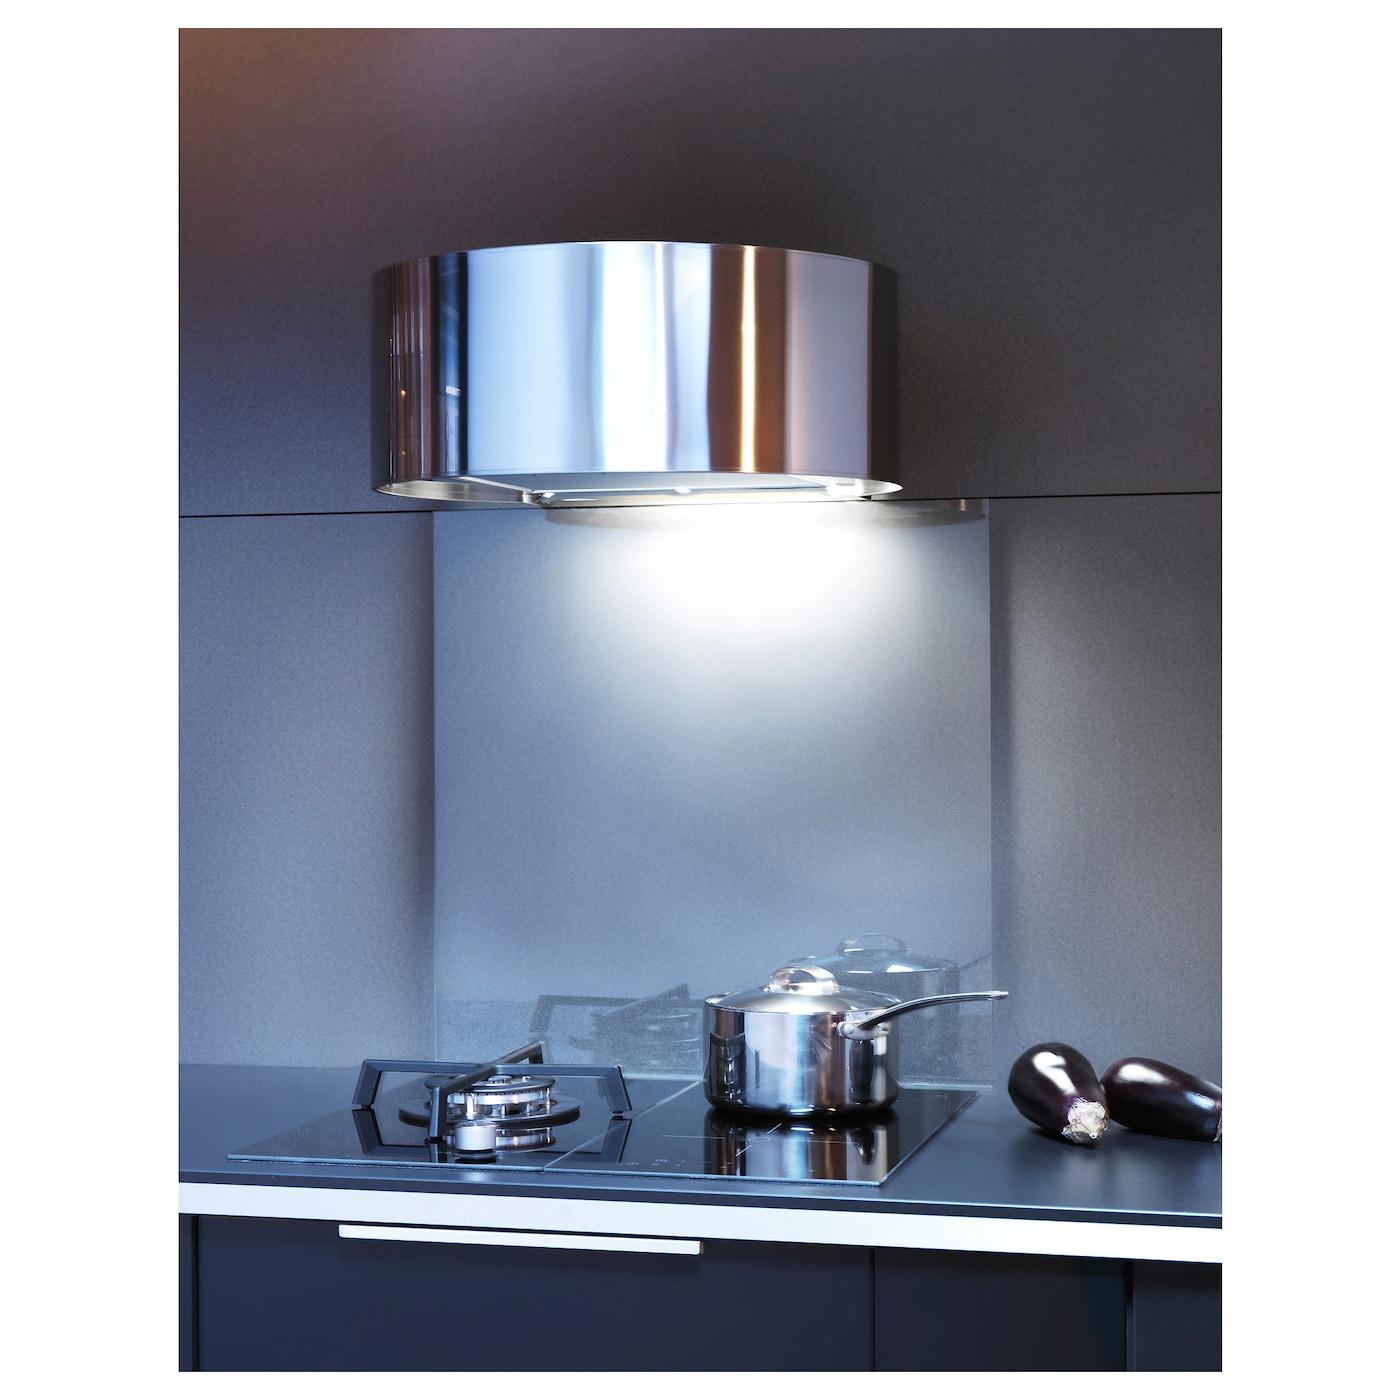 Ikea Kitchen Hood: UDDEN Wall Mounted Extractor Hood Stainless Steel